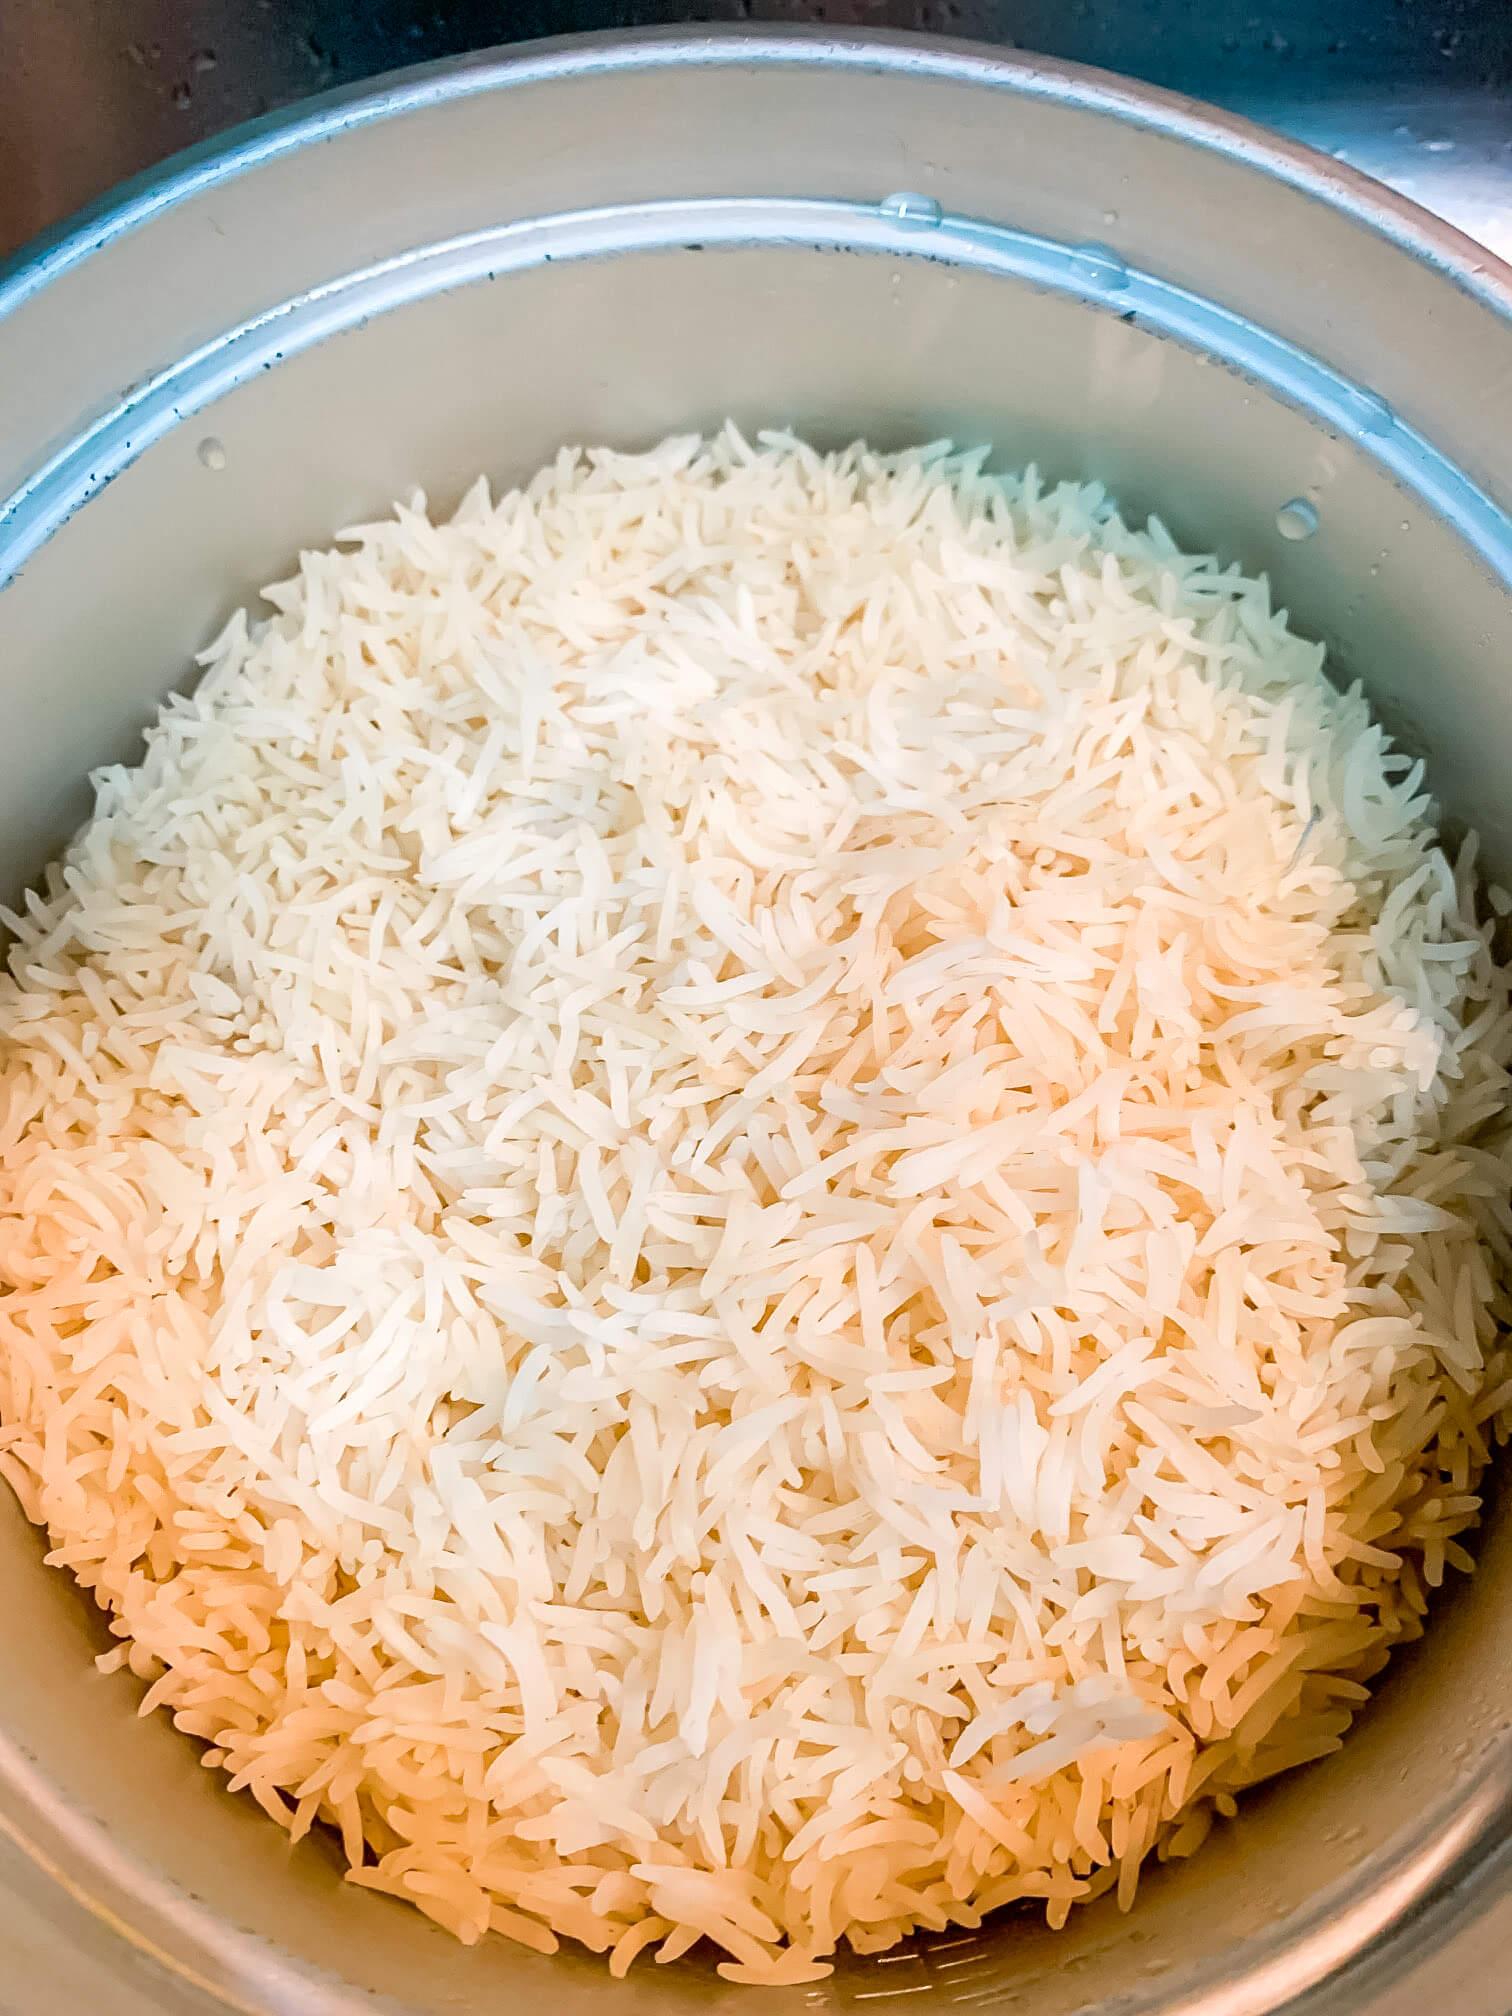 A large pot of plain white rice.